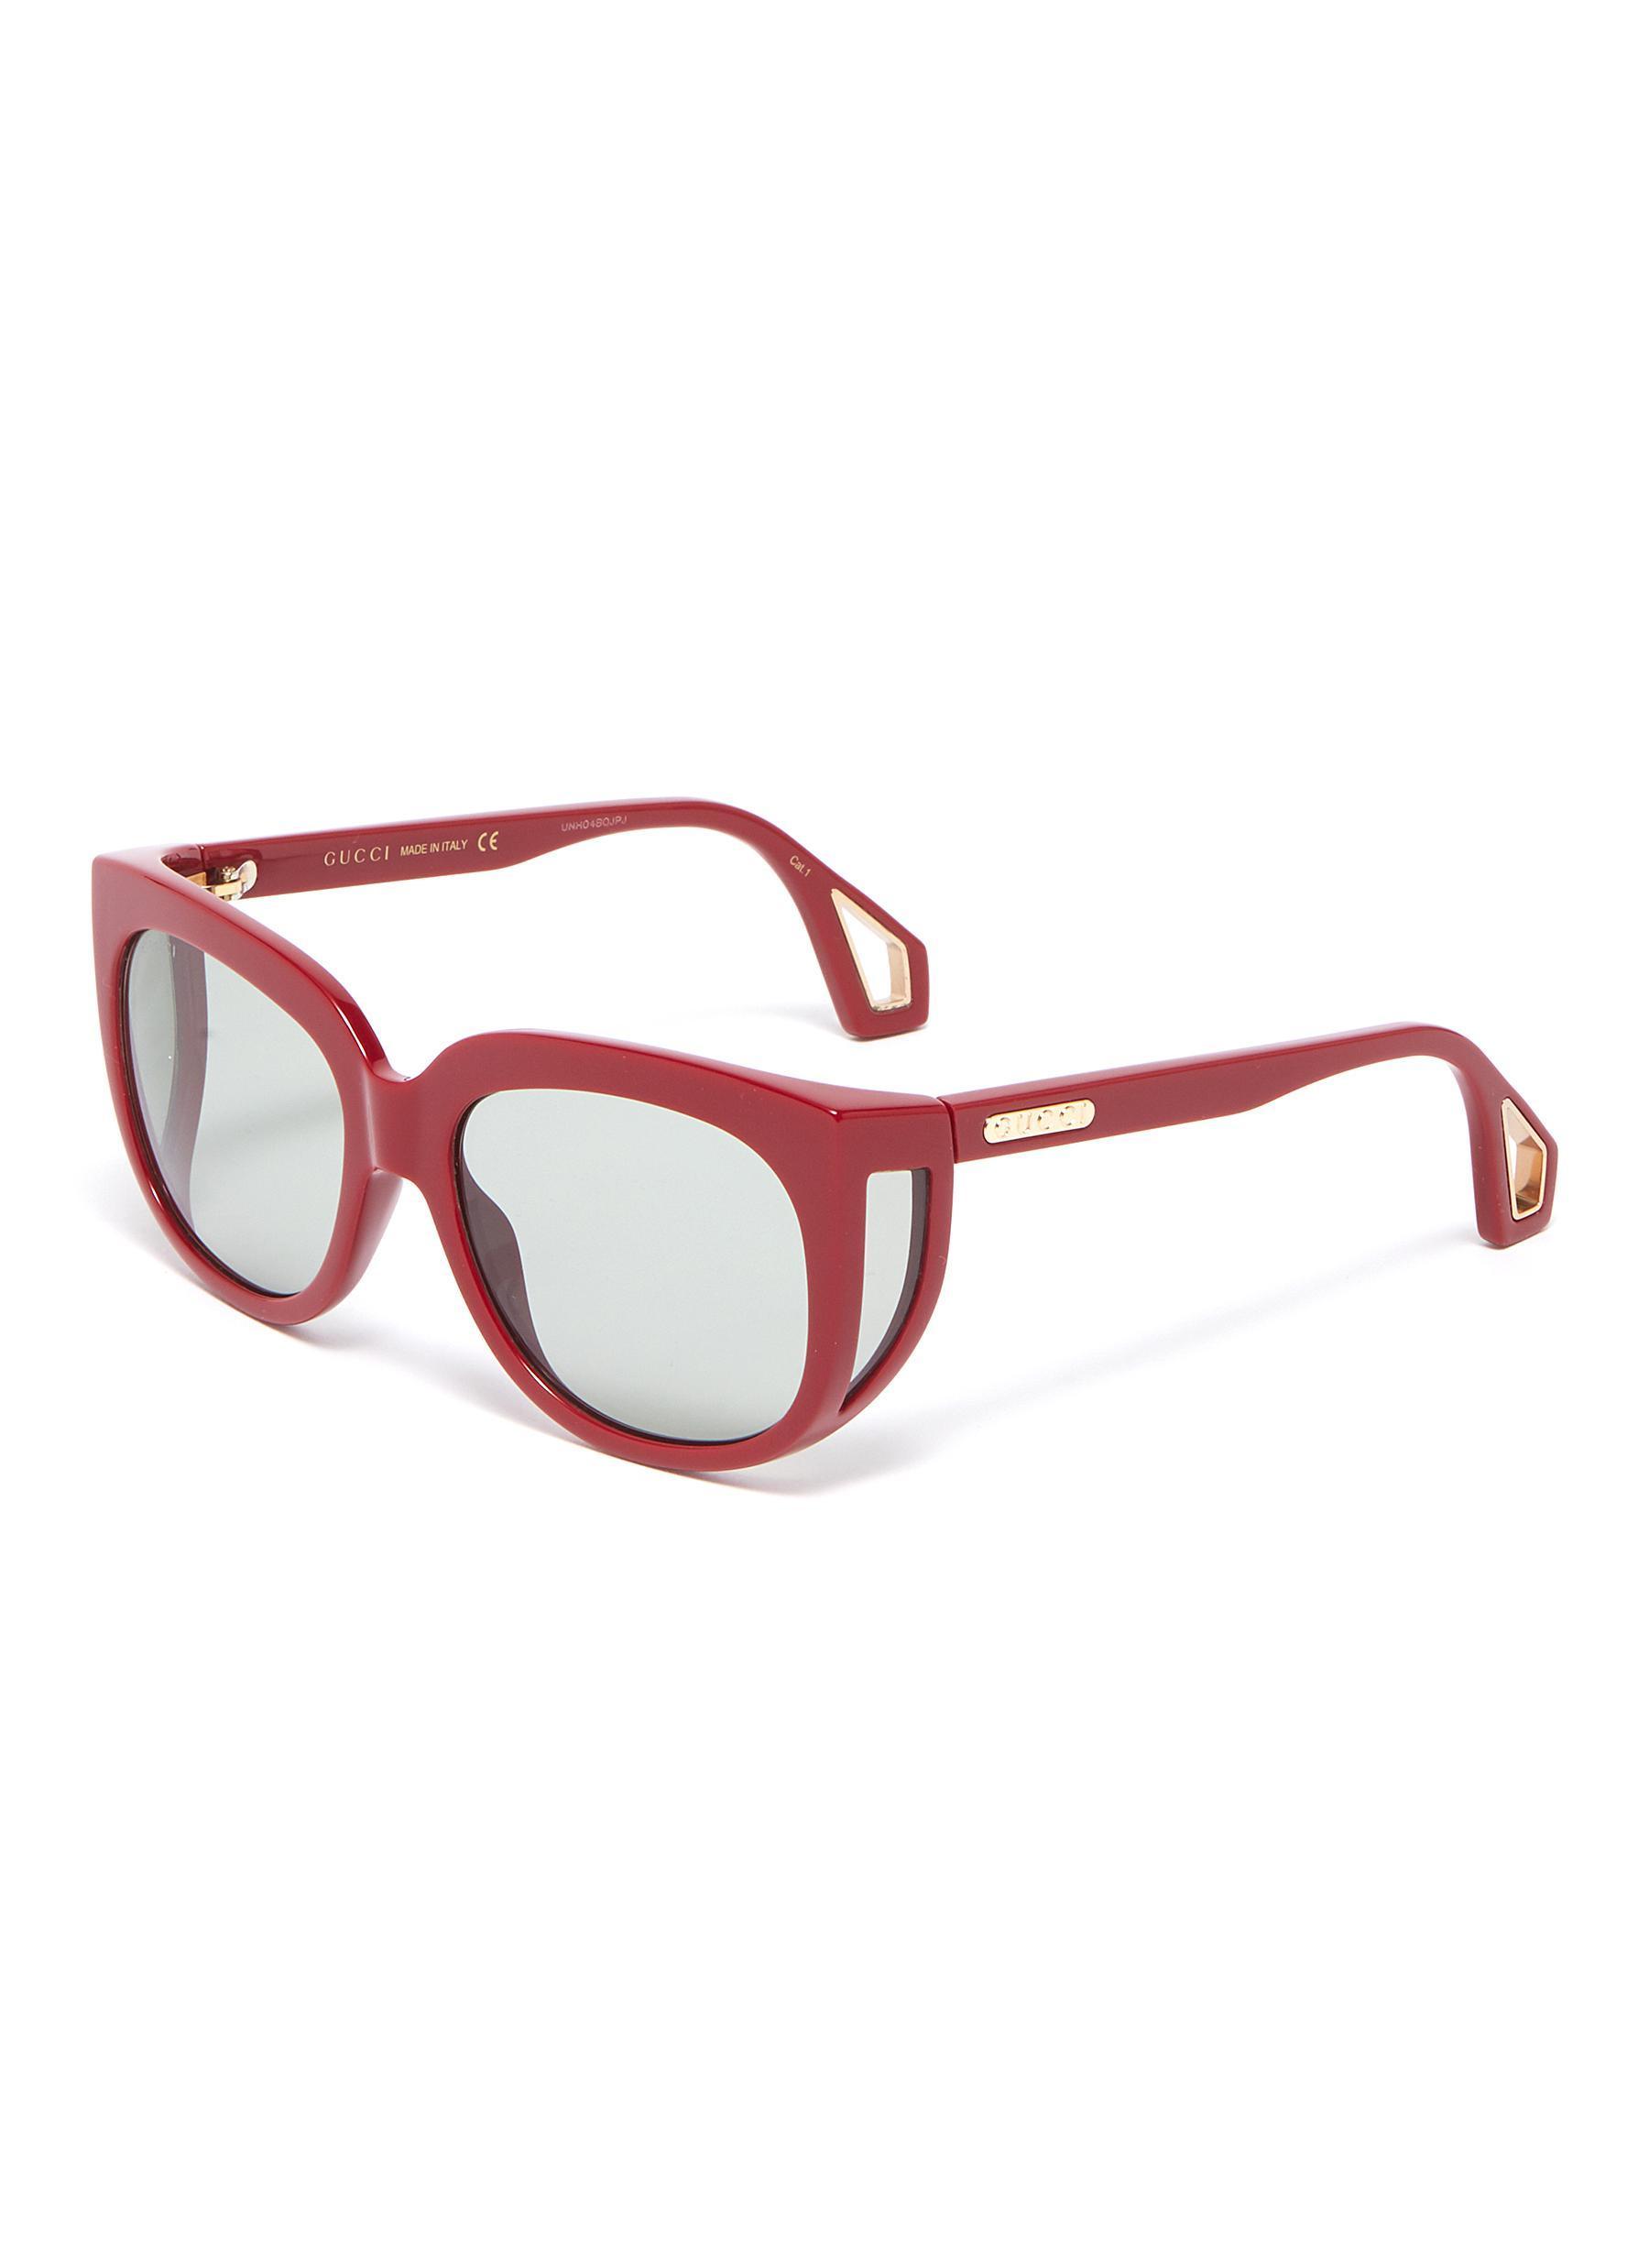 6f7228539cc20 Gucci Spoiler Acetate Square Sunglasses in Red - Lyst